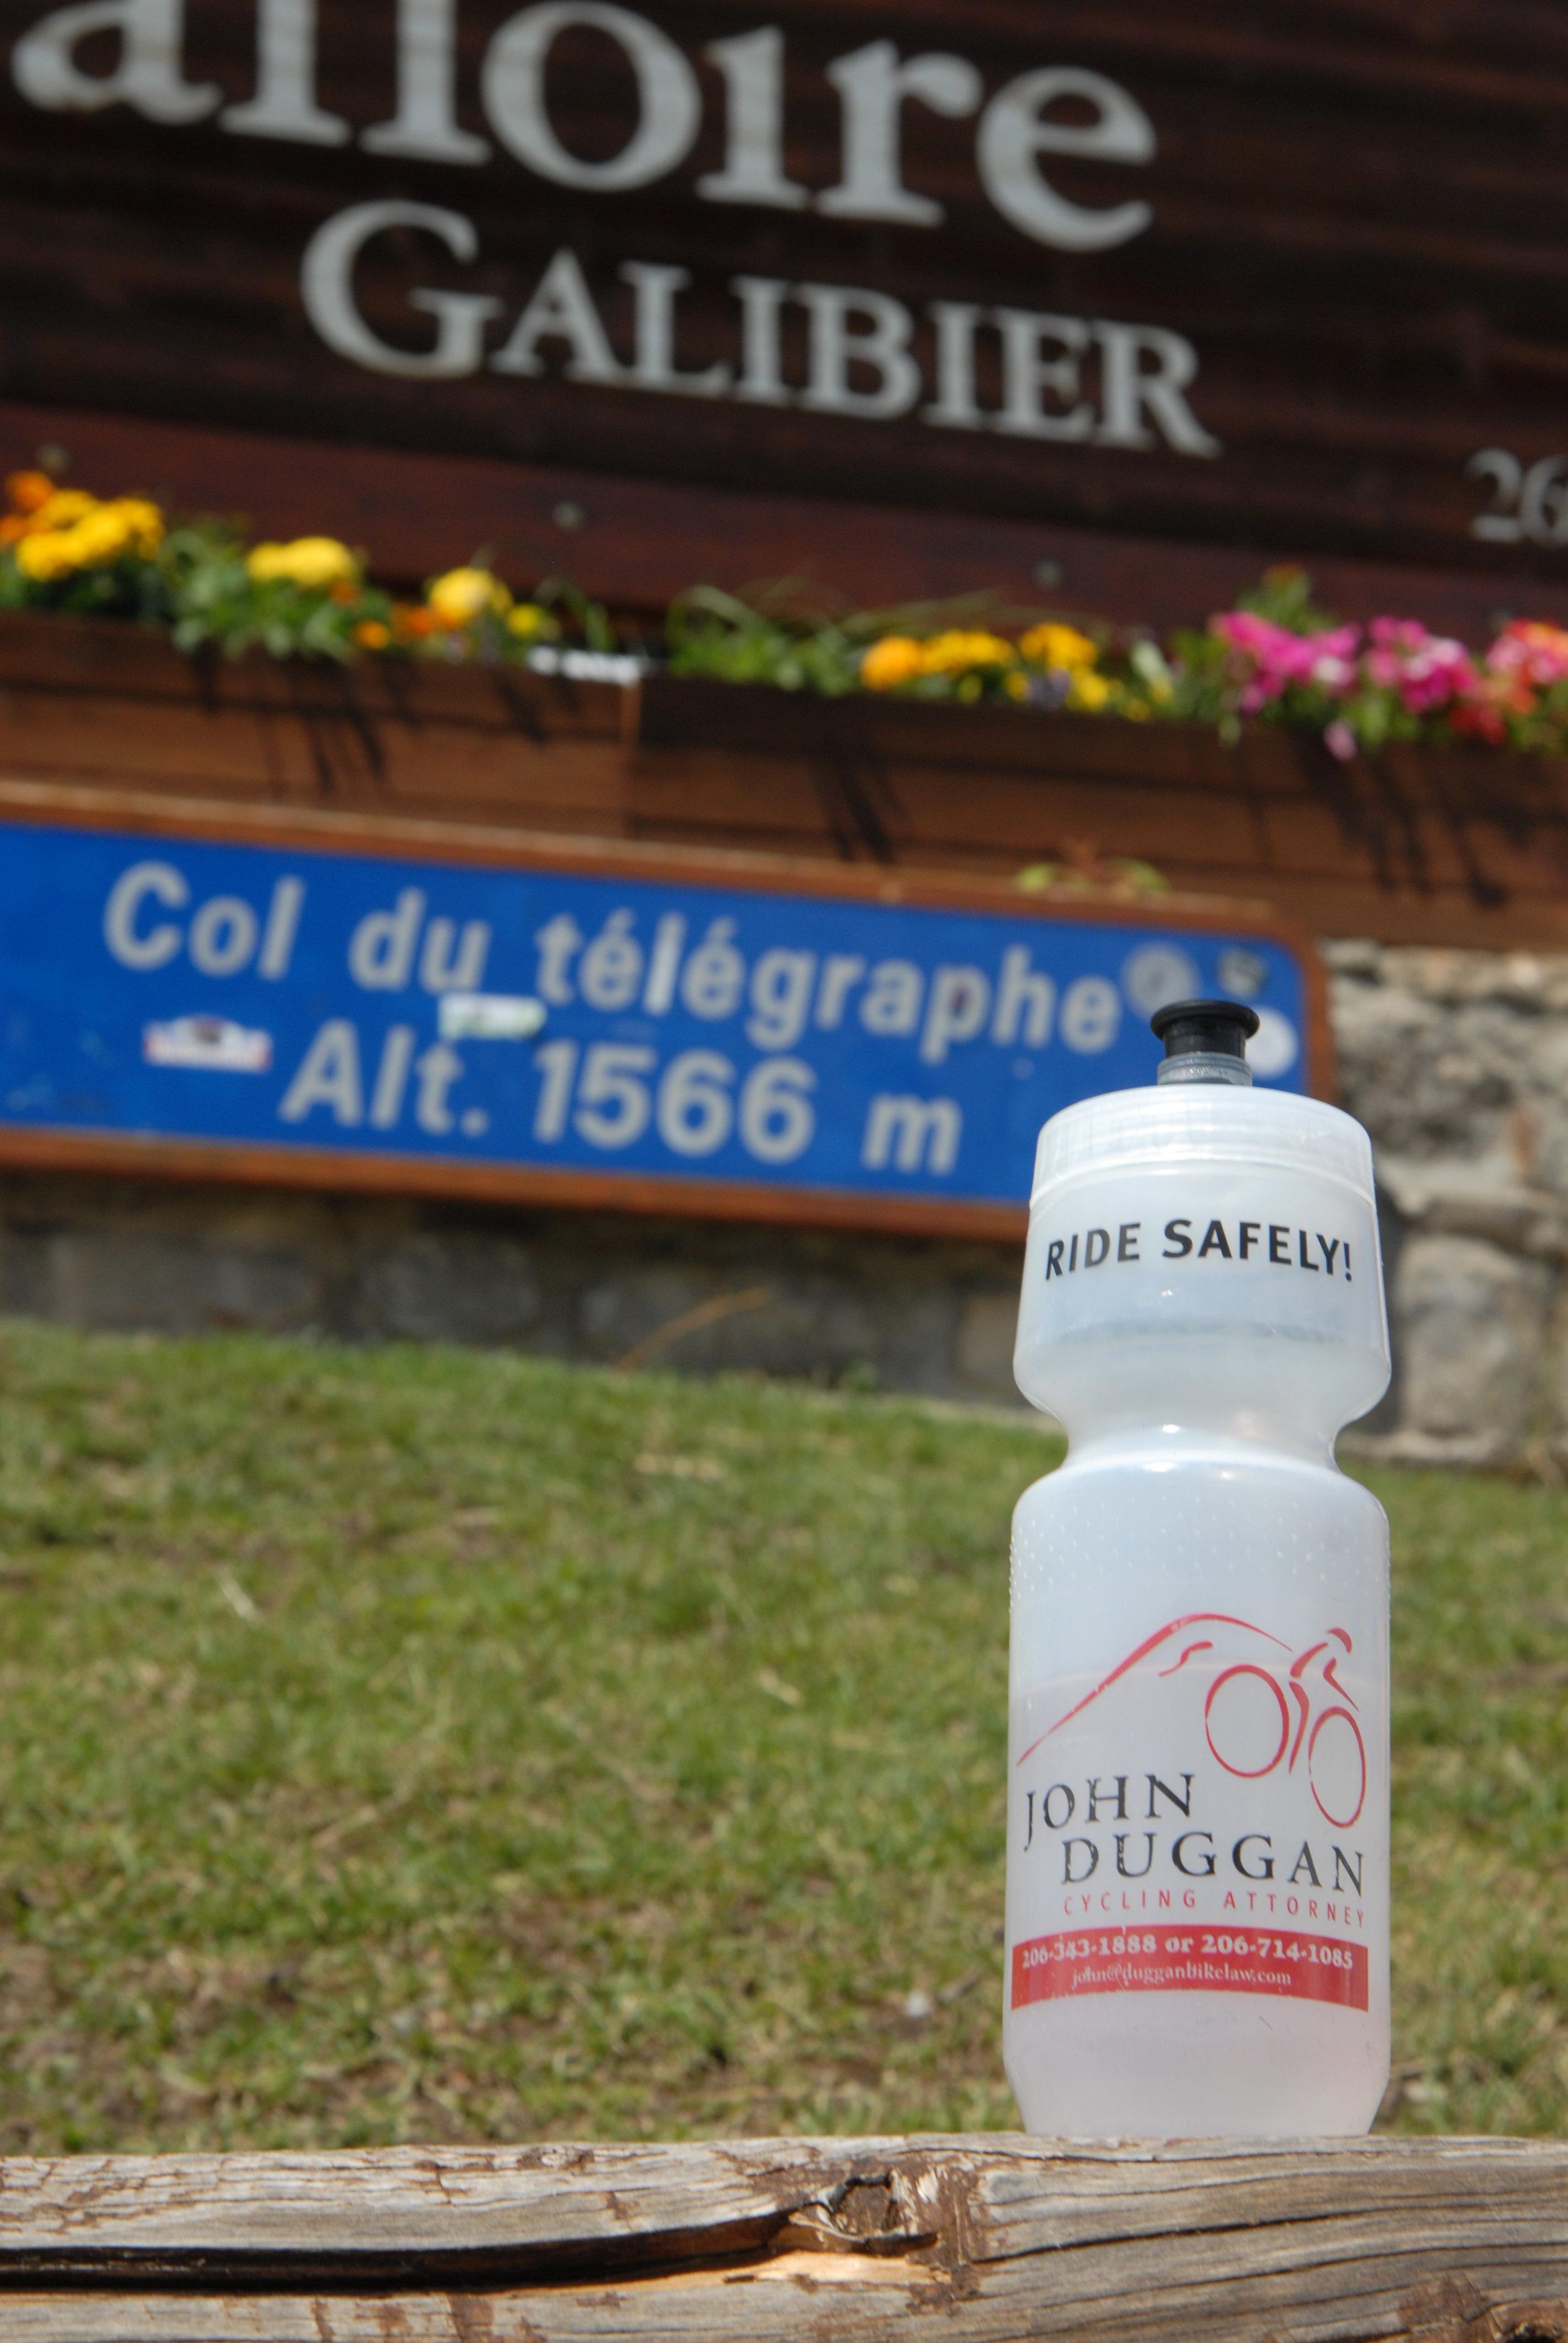 Col du Telegraphe, French Alps